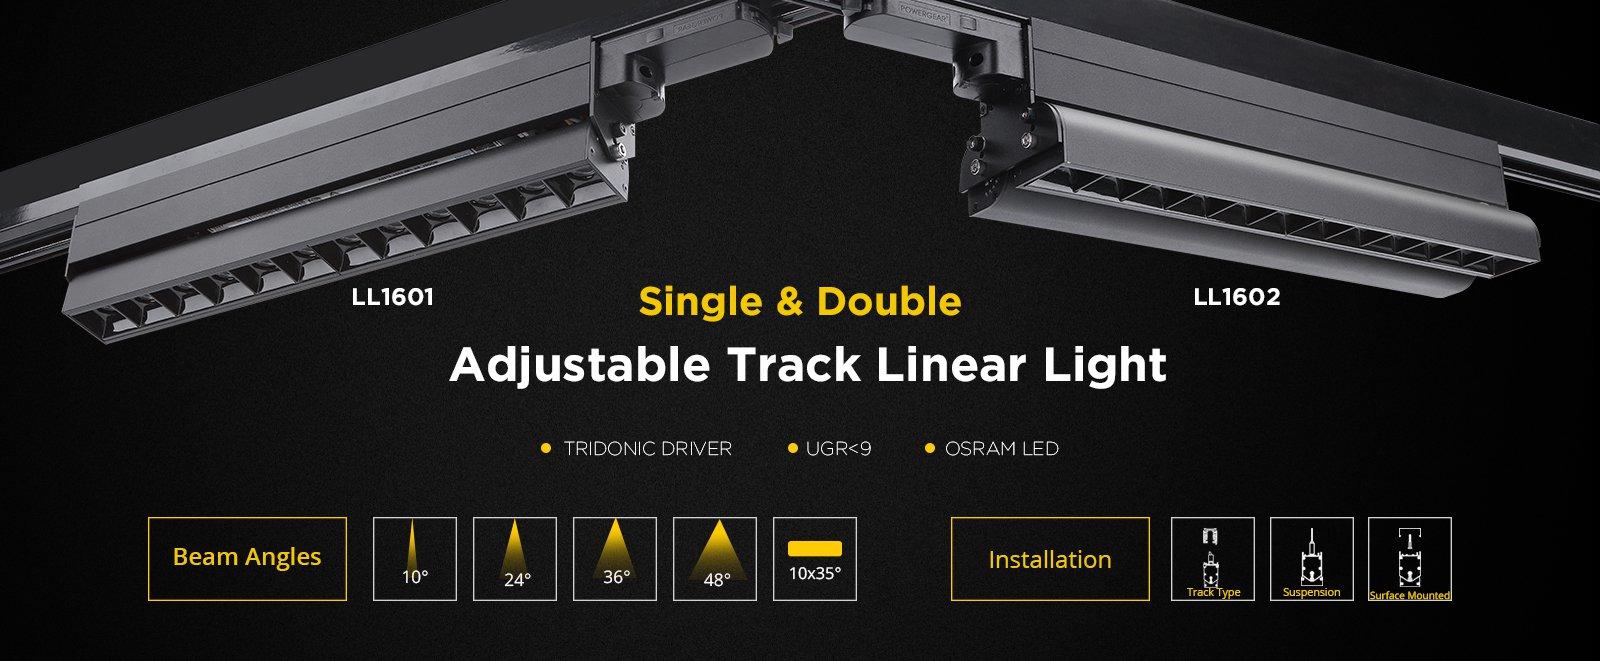 48v track systems for retail lighting